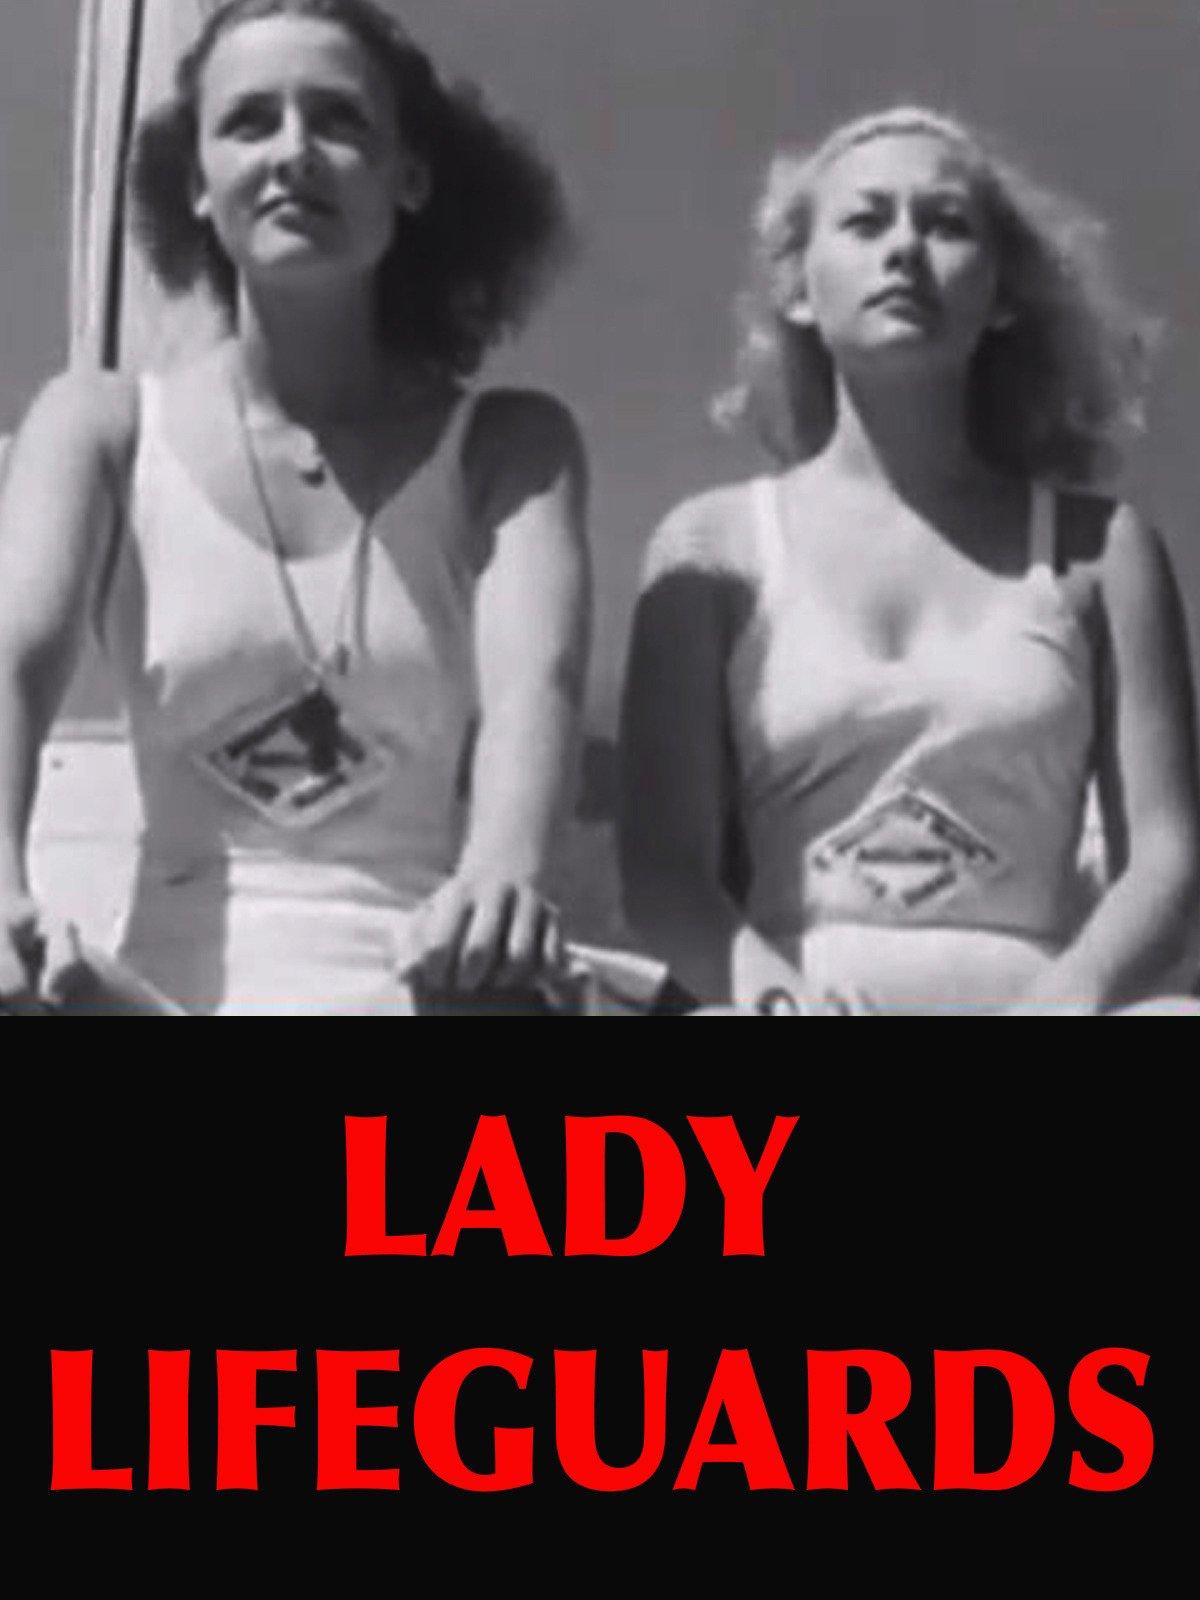 Lady Lifeguards